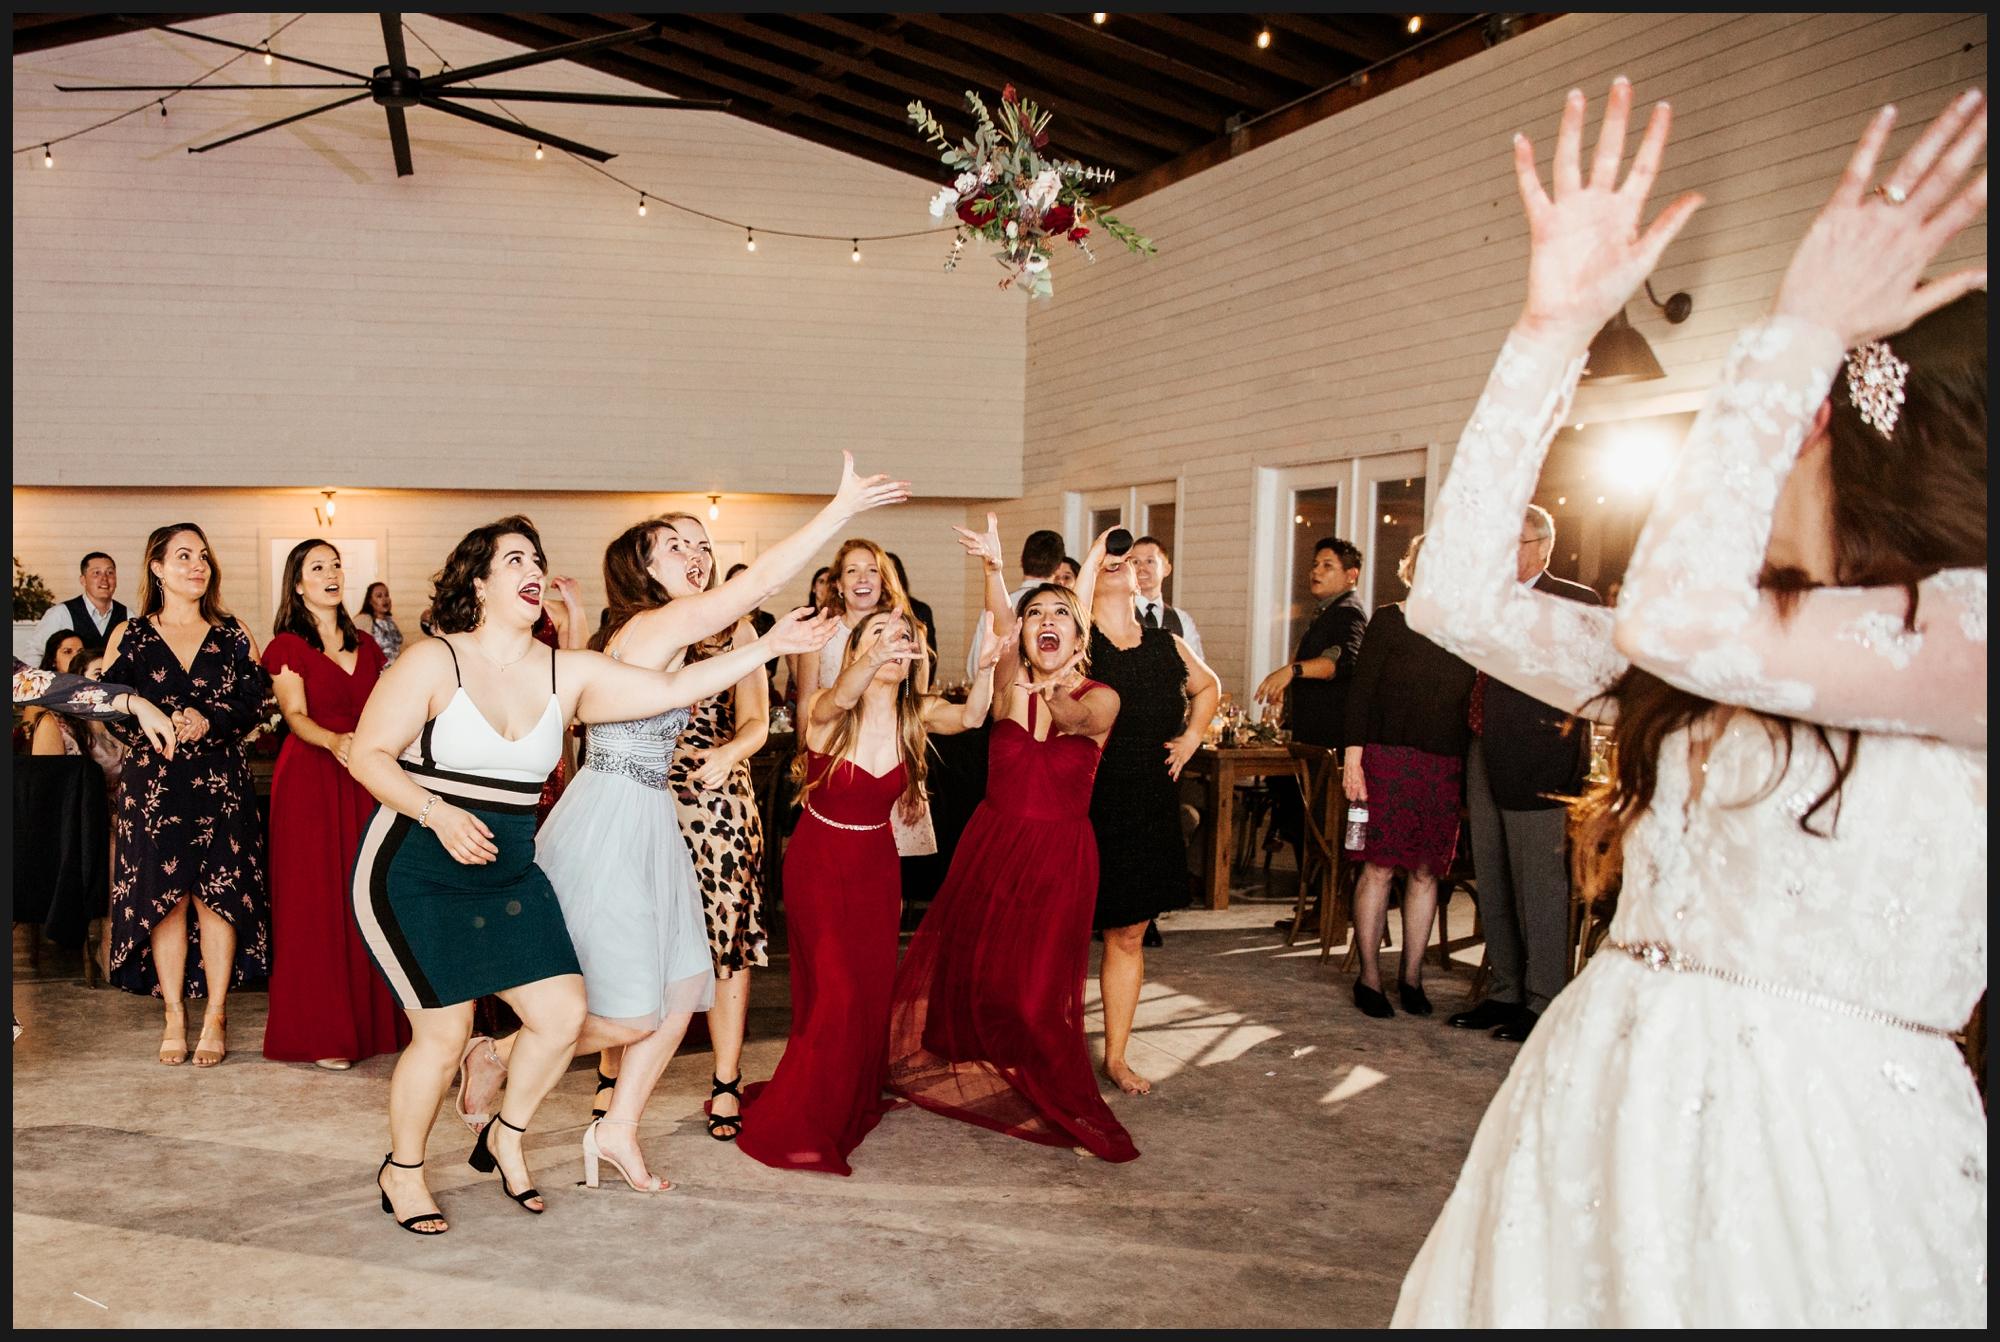 Orlando-Wedding-Photographer-destination-wedding-photographer-florida-wedding-photographer-hawaii-wedding-photographer_0546.jpg